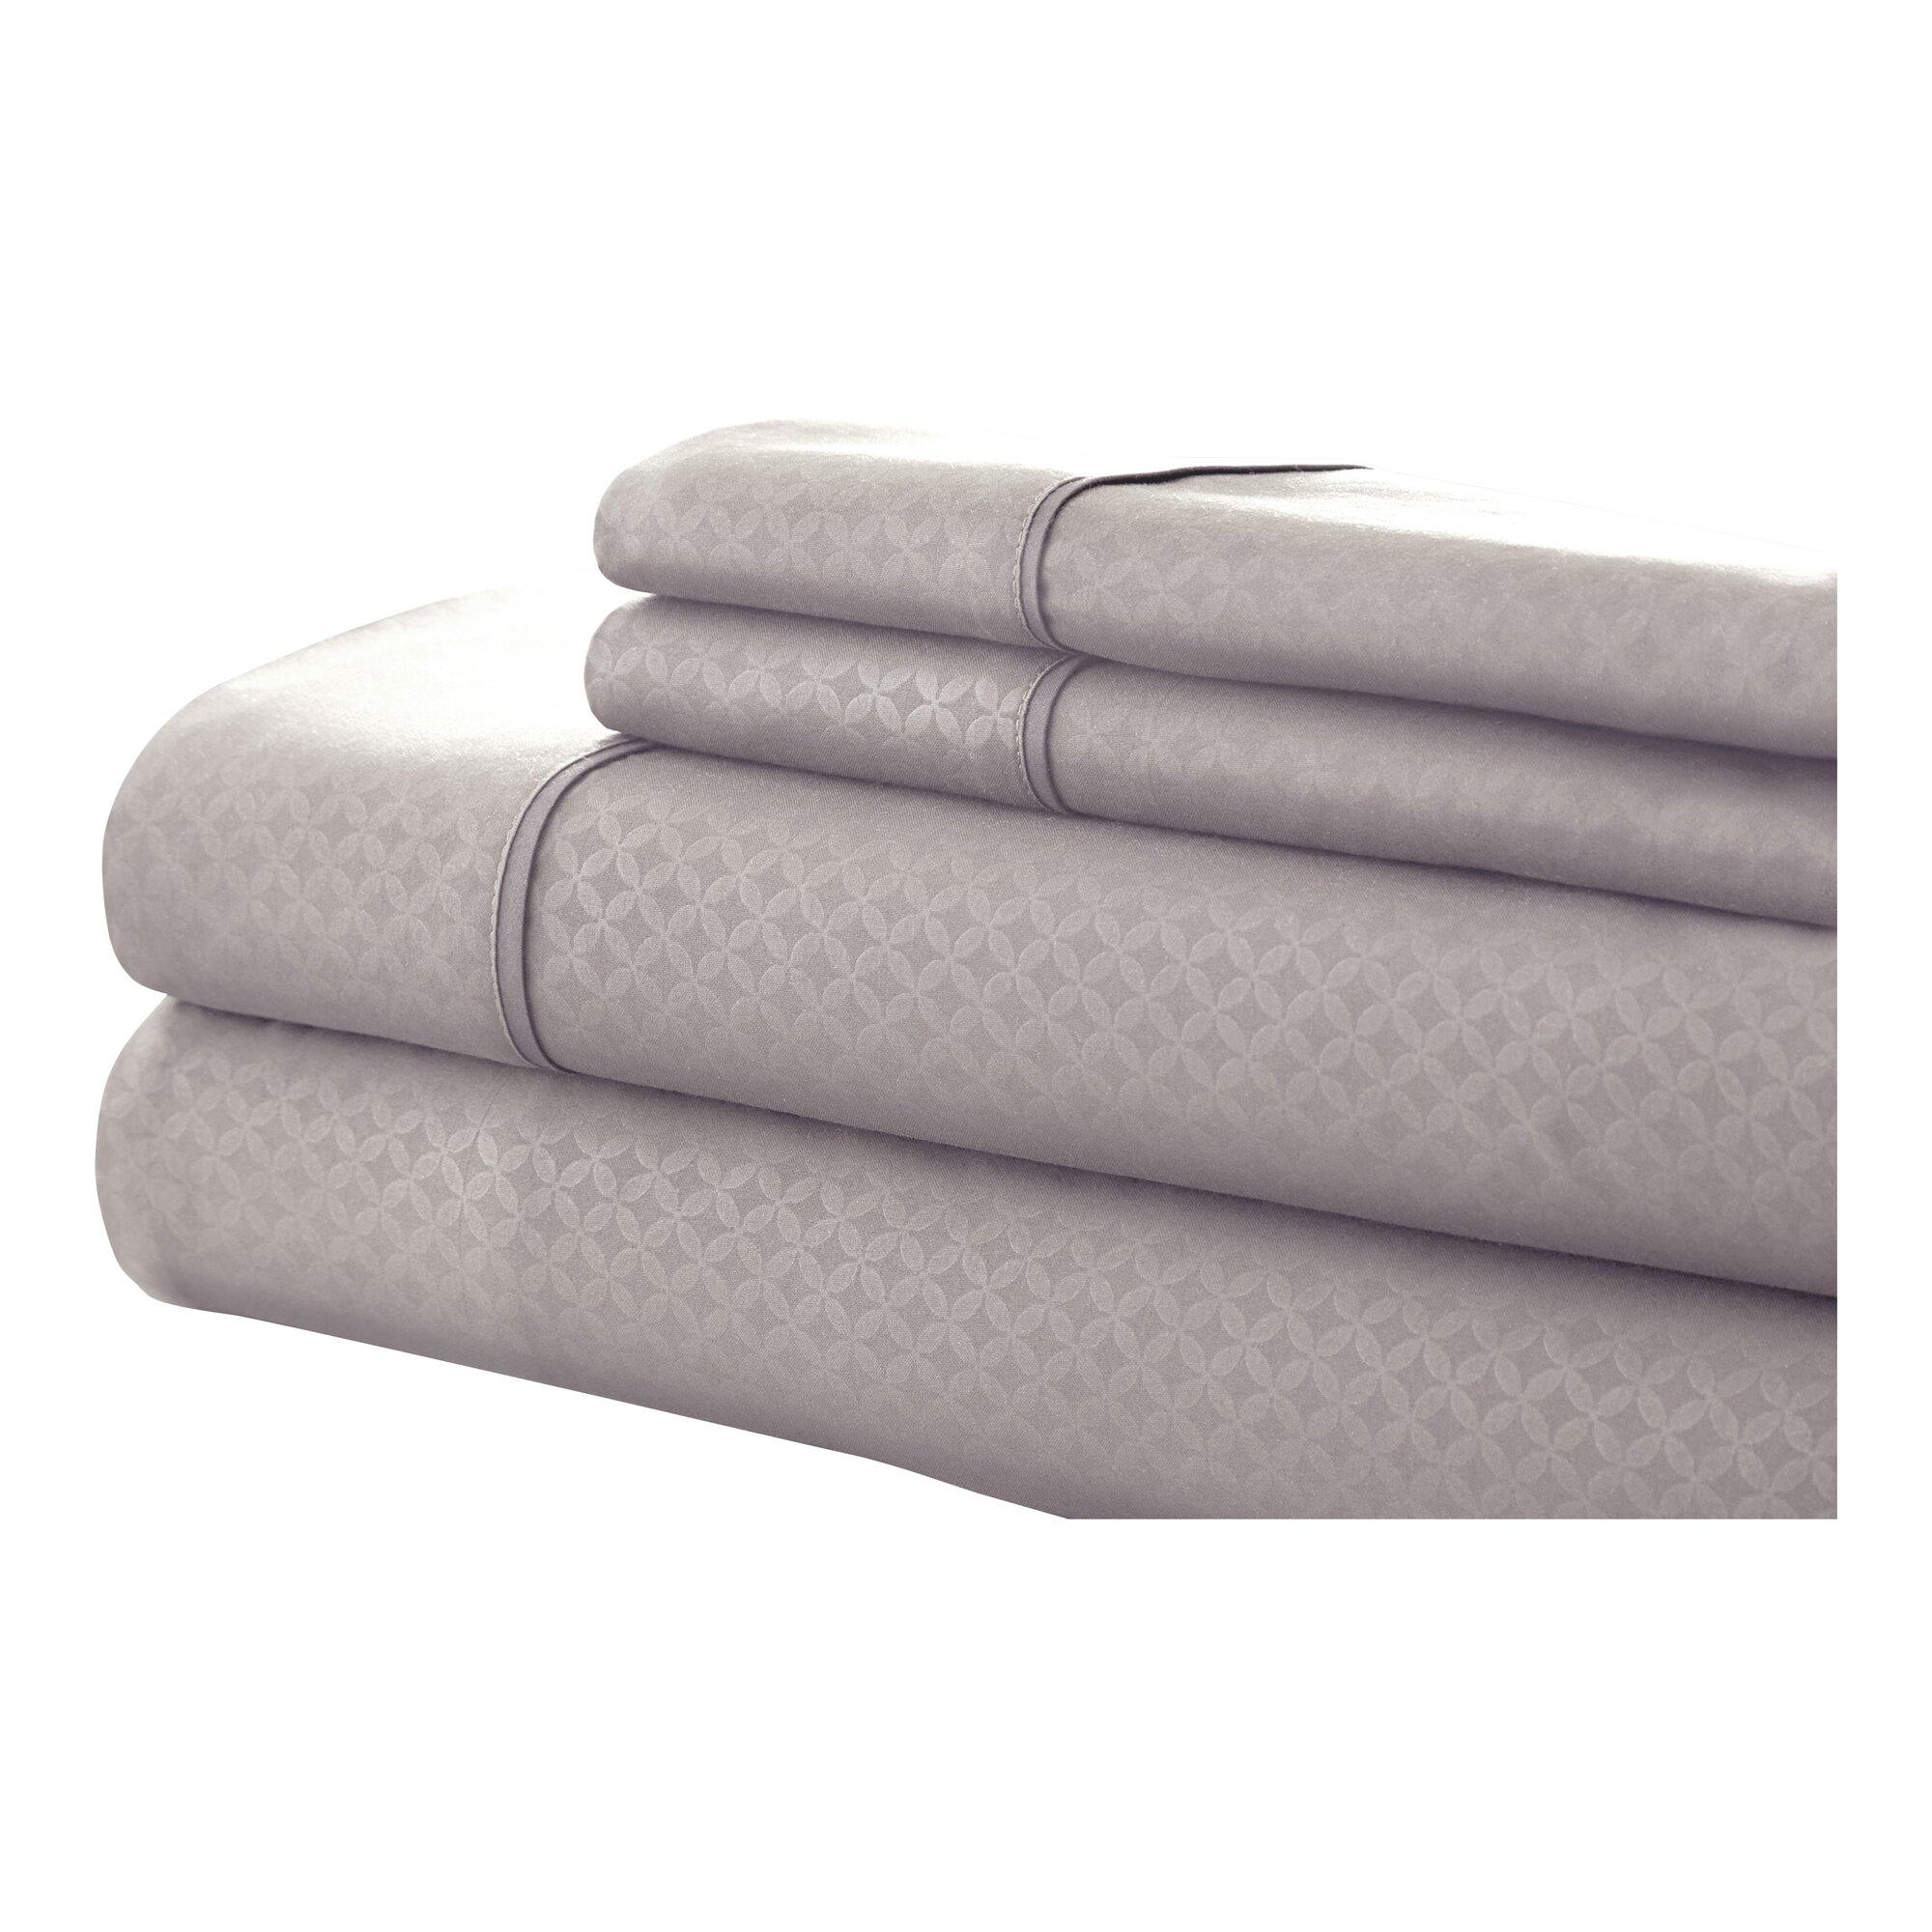 Colonial Textiles SoHo 4 Piece Sheet Set & Reviews   Wayfair